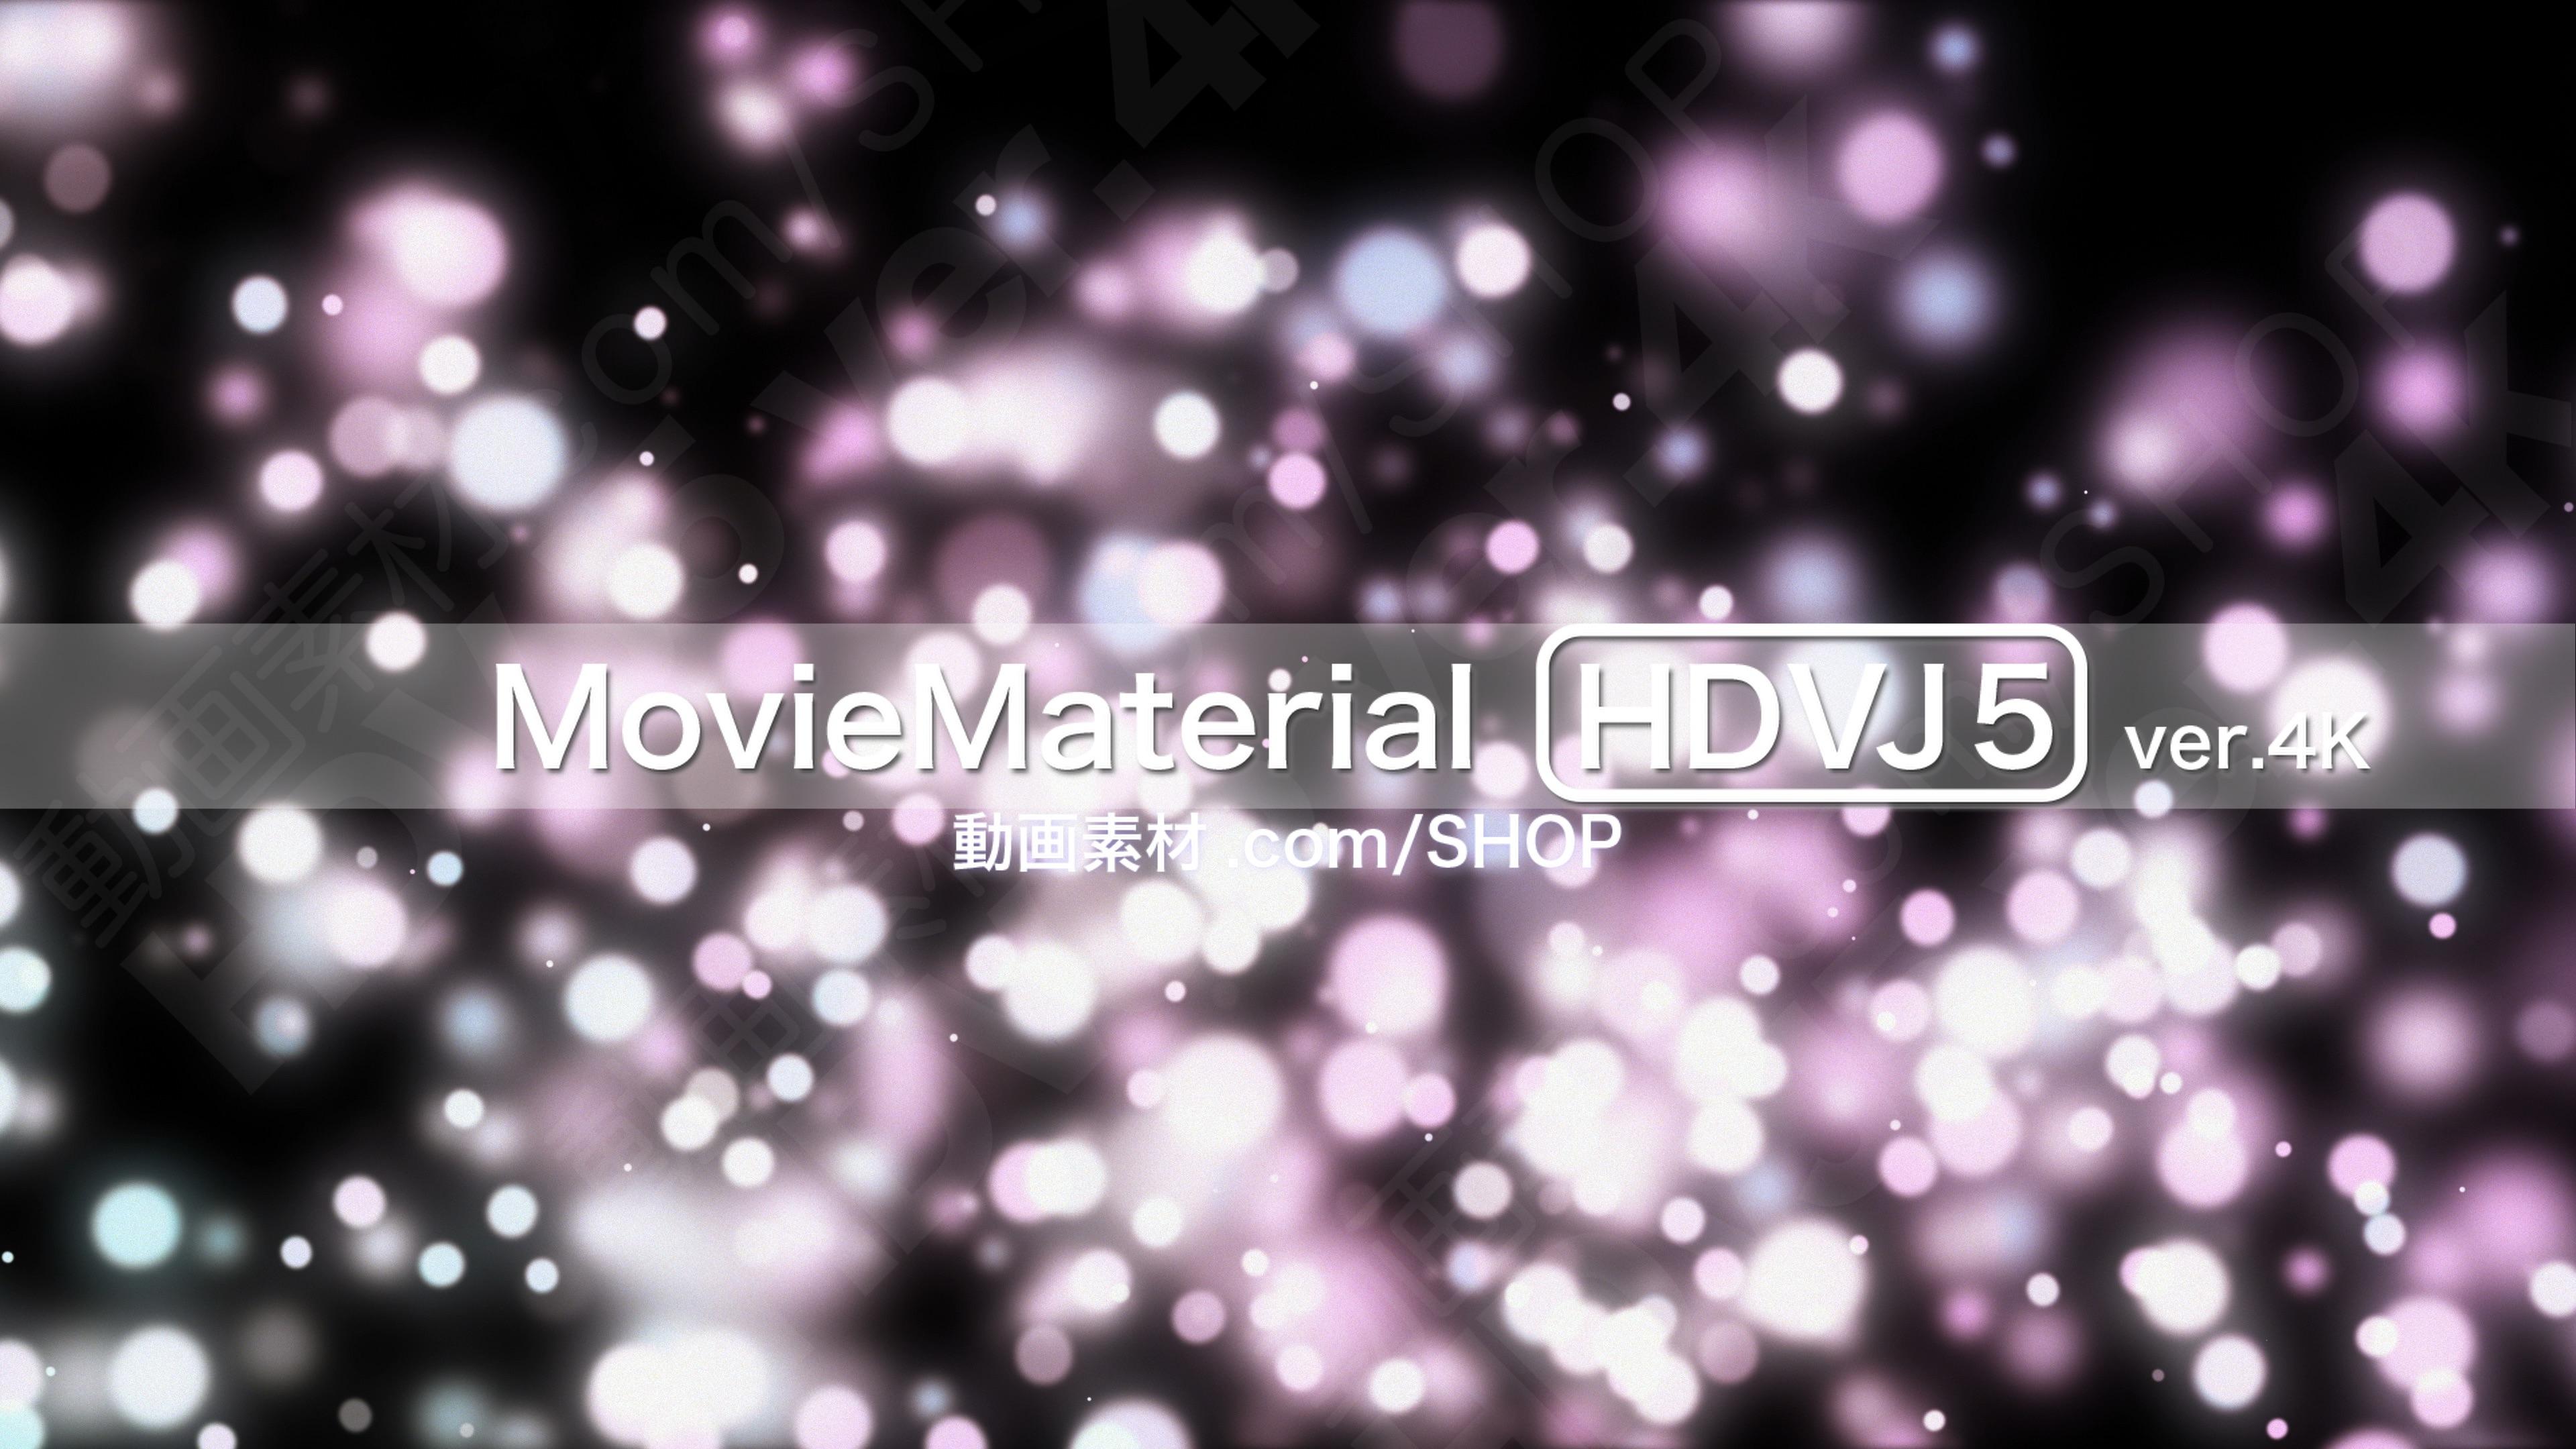 4K2Kループ動画素材集第5段【MovieMaterial HDVJ5 ver.4K】ロイヤリティフリー(著作権使用料無料)7